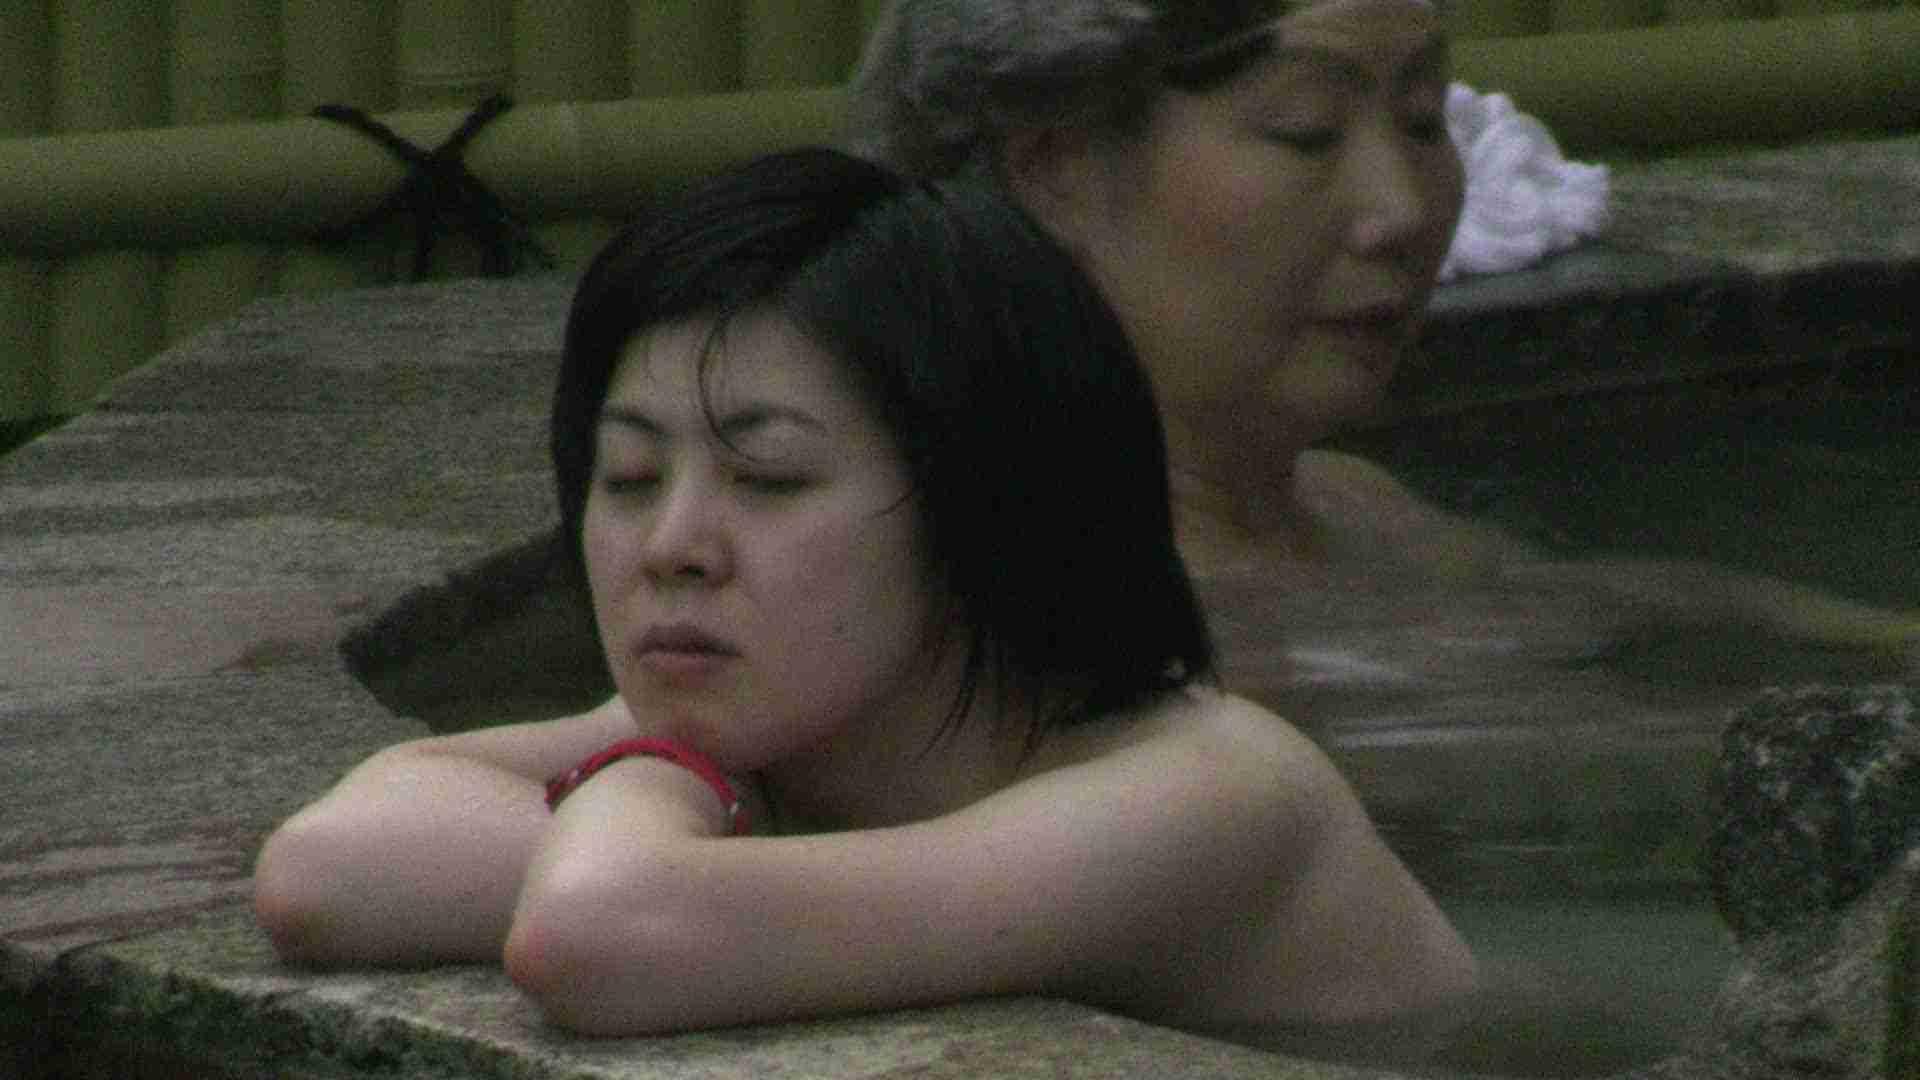 Aquaな露天風呂Vol.685 OLのプライベート   盗撮特撮  13pic 7